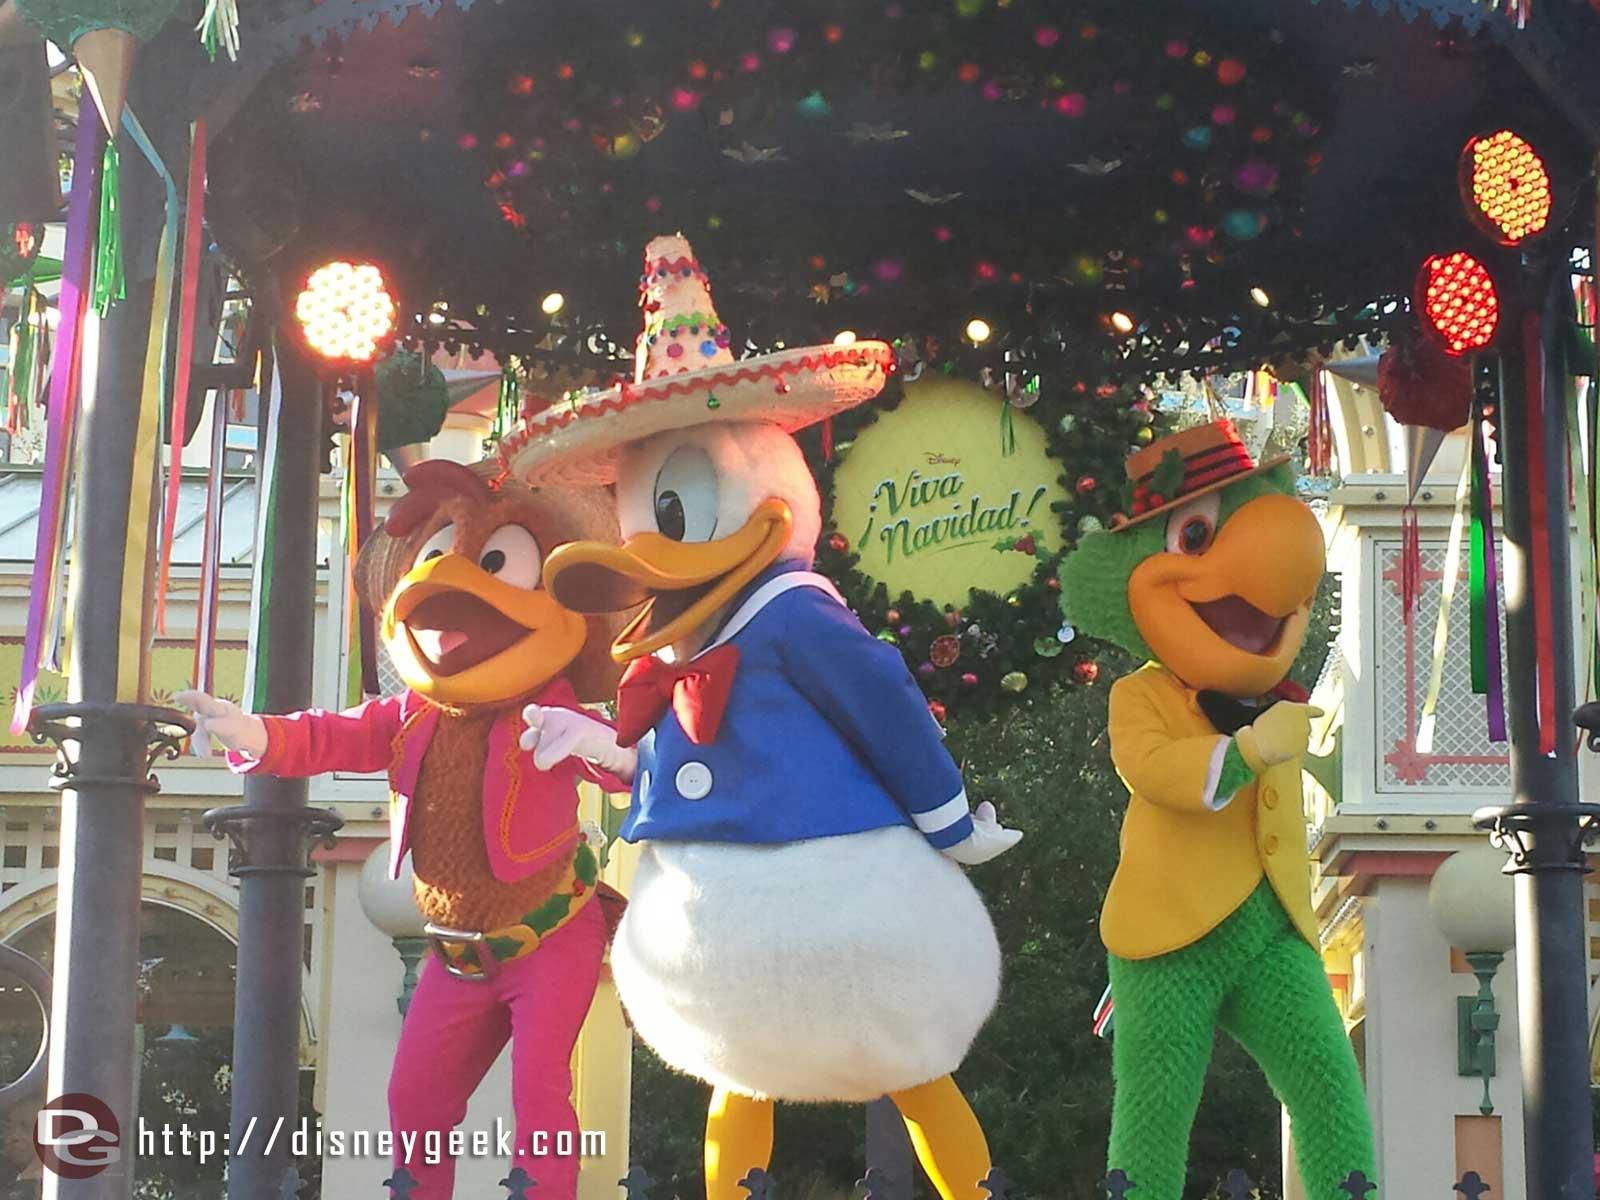 ¡Viva Navidad! Street Party time